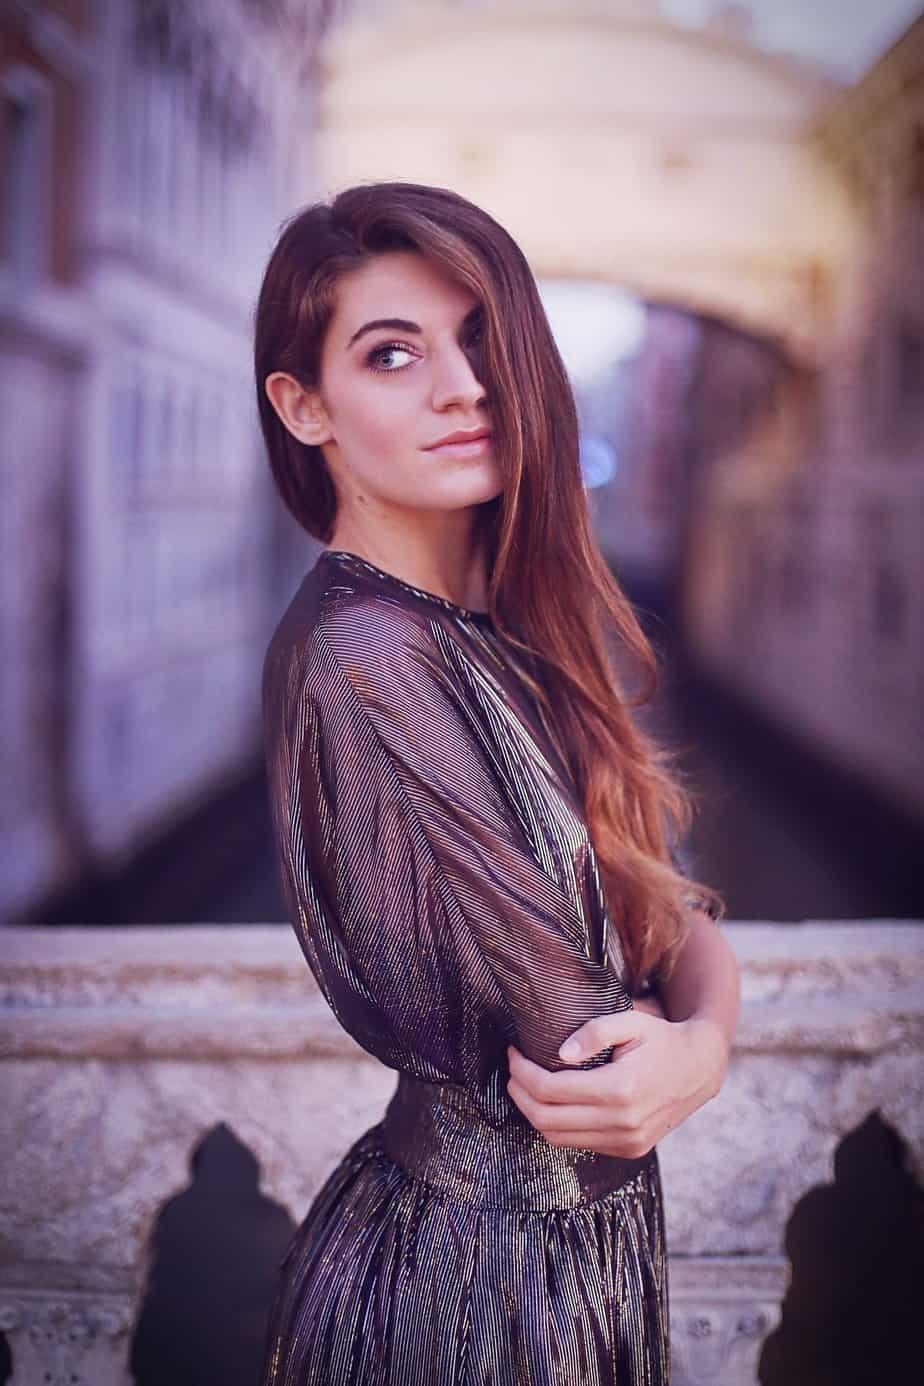 Flora_venice_Venezia_florasrunway_floradallevacche_FrancescaBandiera